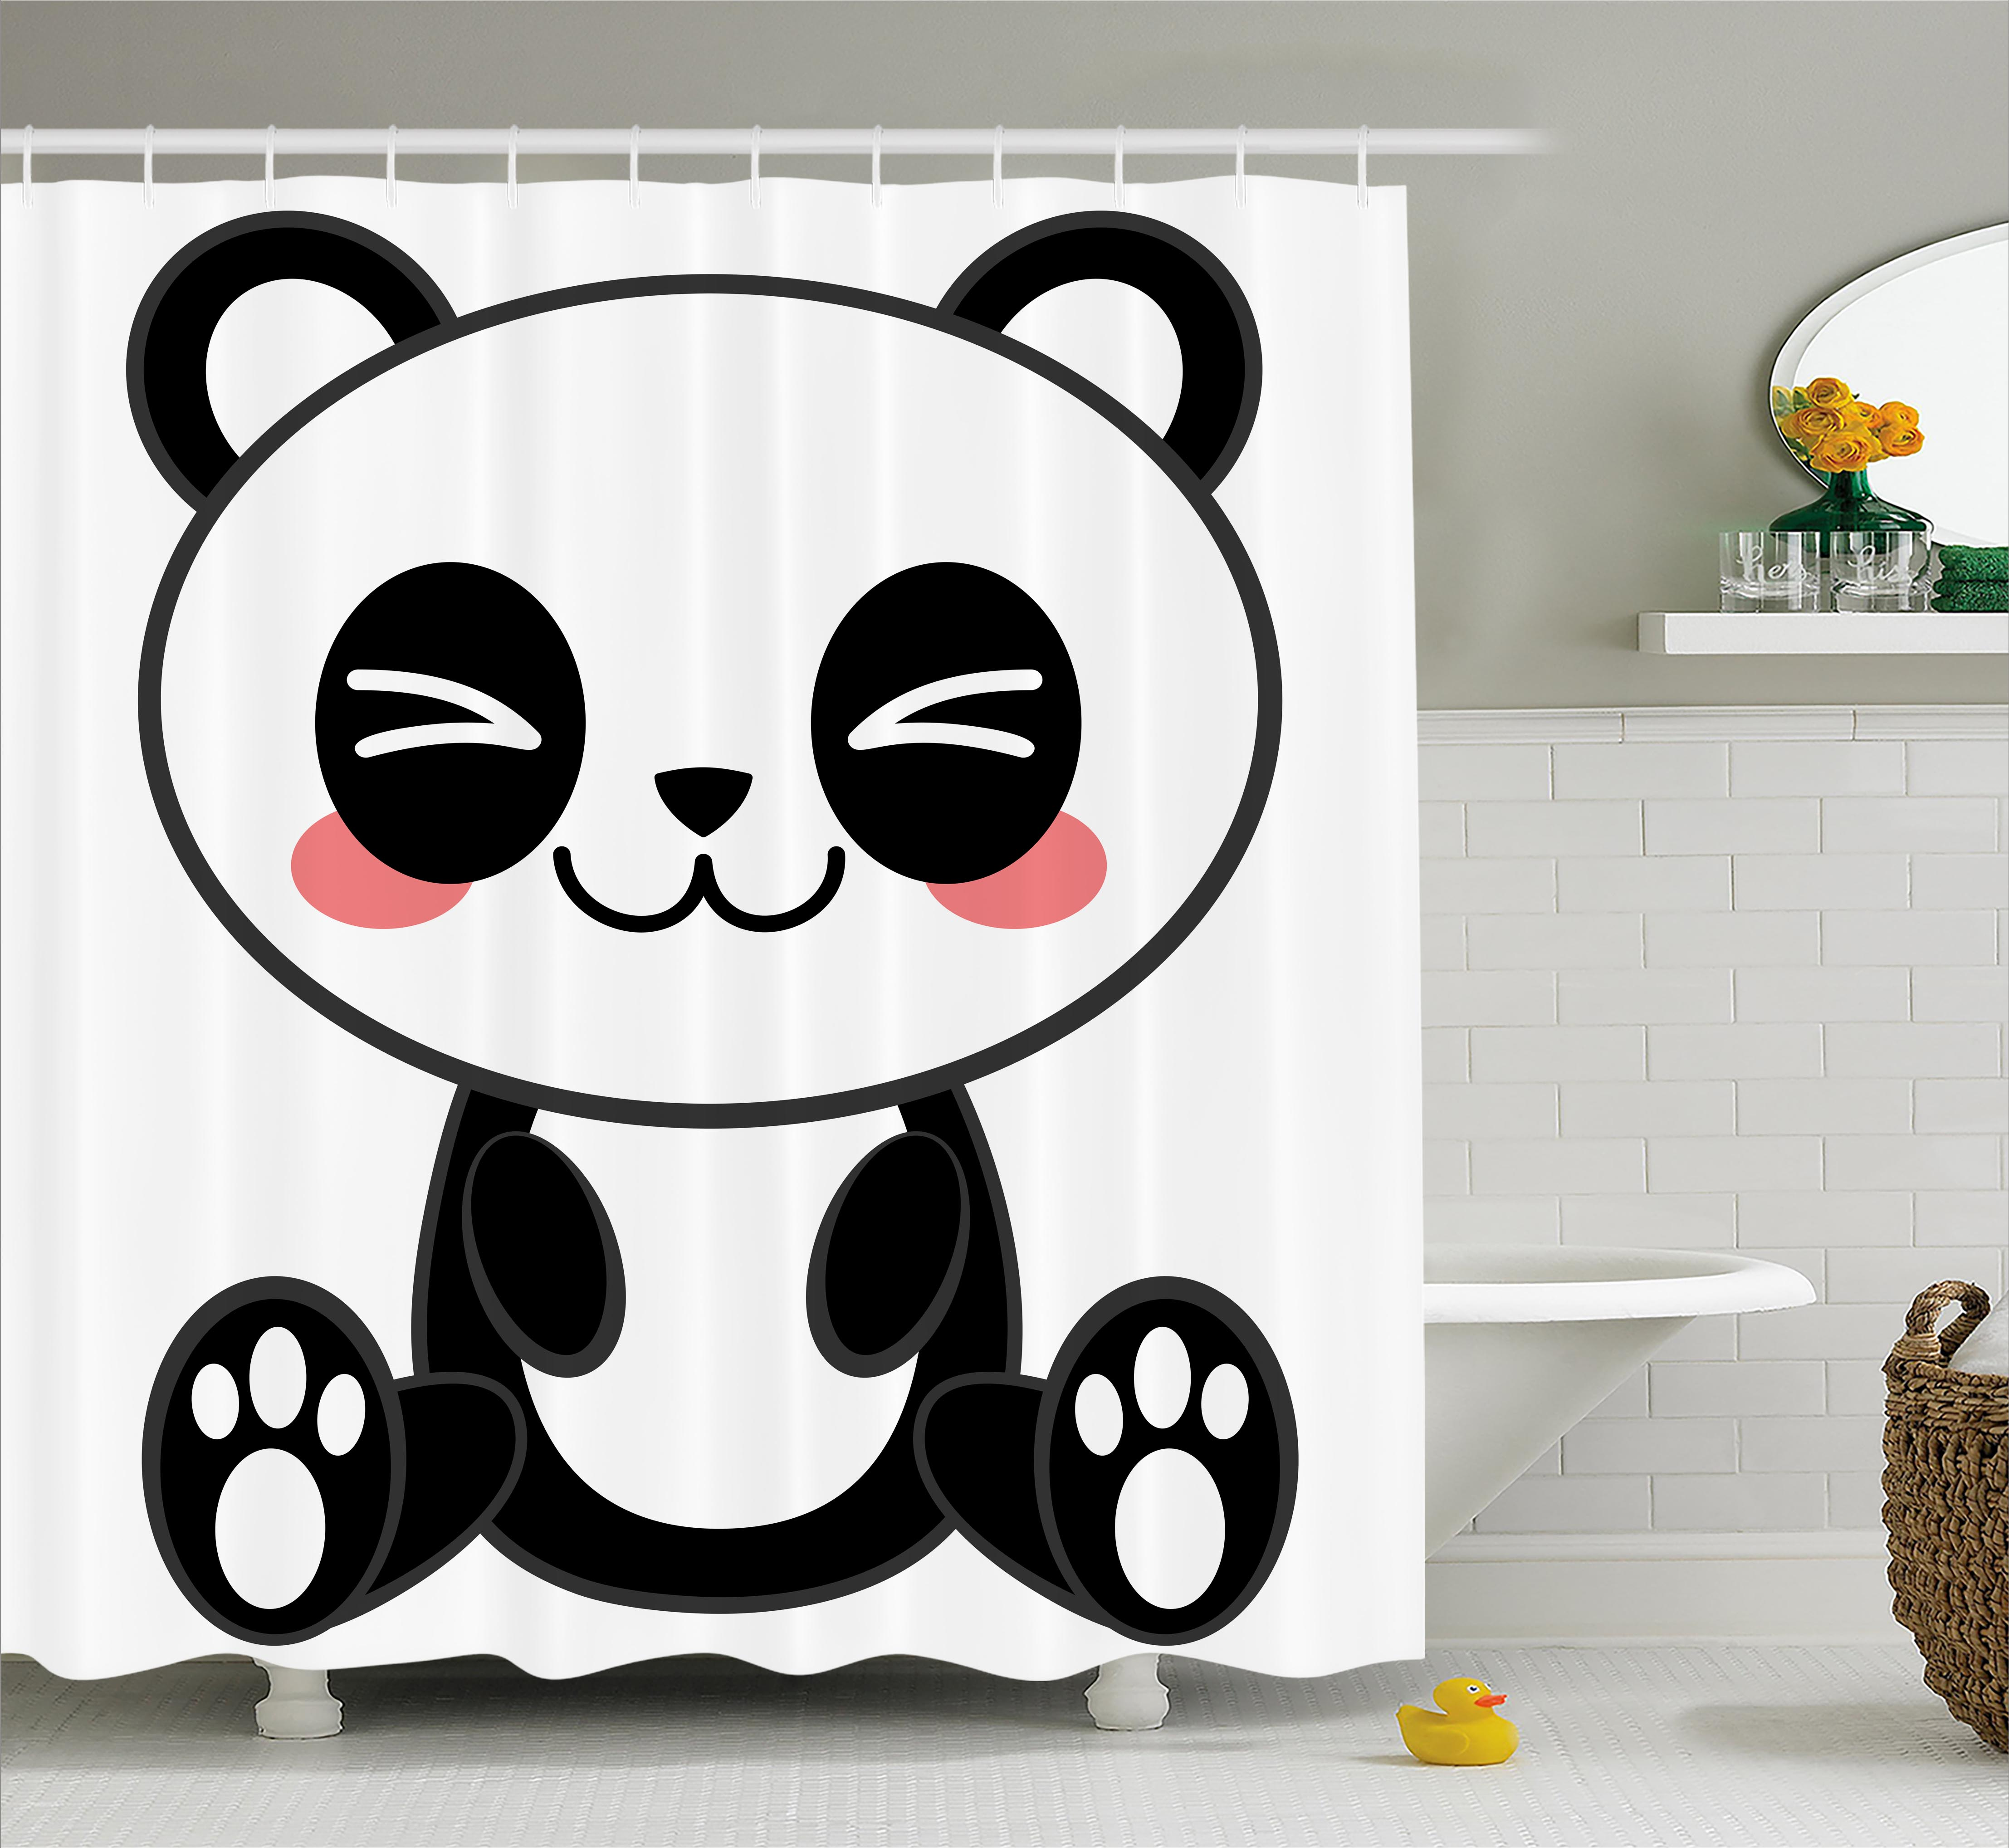 Anime Shower Curtain, Cute Cartoon Smiling Panda Fun Animal Theme Japanese Manga Kids Teen Art Print, Fabric Bathroom Set with Hooks, 69W X 75L Inches Long, Black White Gray, by Ambesonne